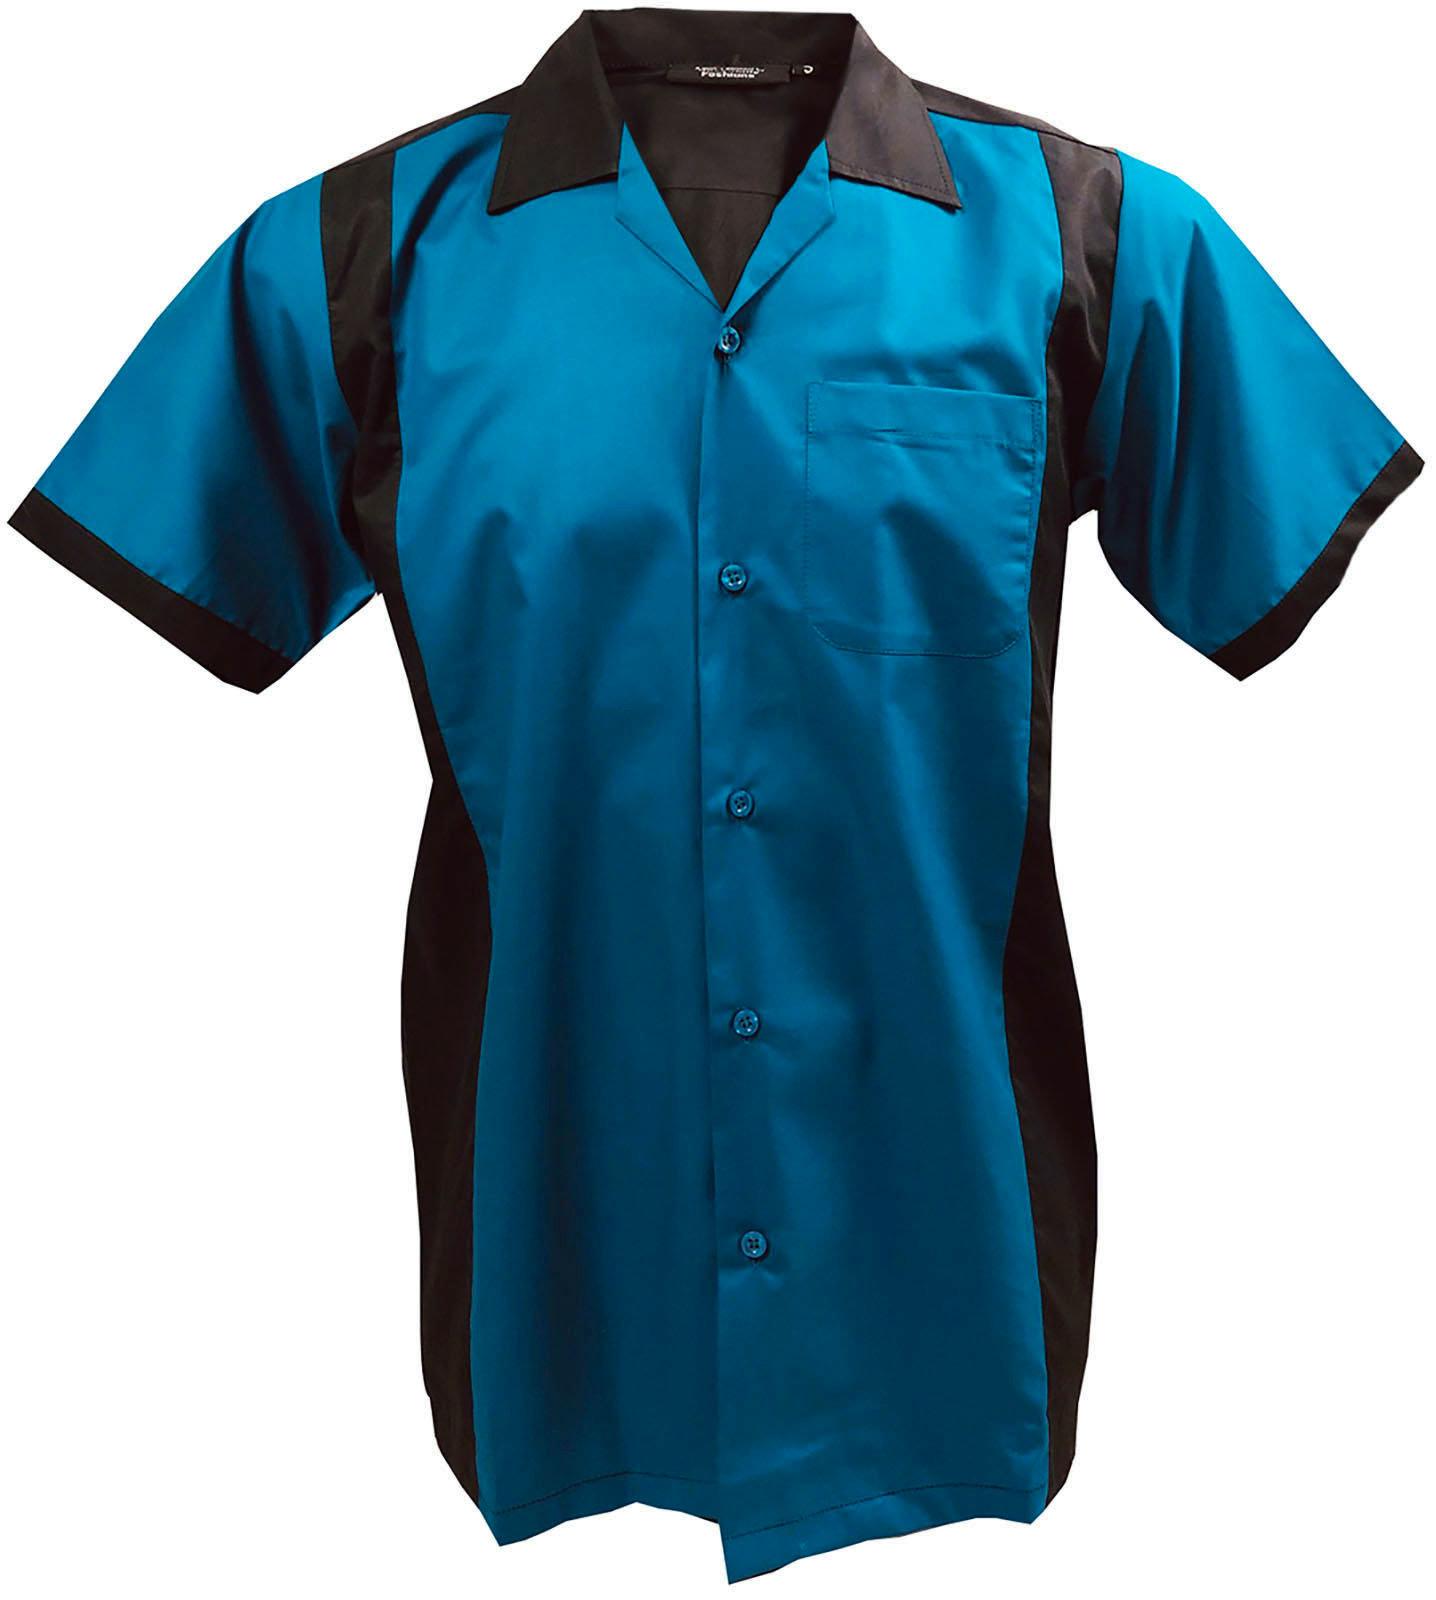 Brunswick Men/'s Ace Zone Retro Vintage Polo Bowling Shirt Black Red Rockabilly